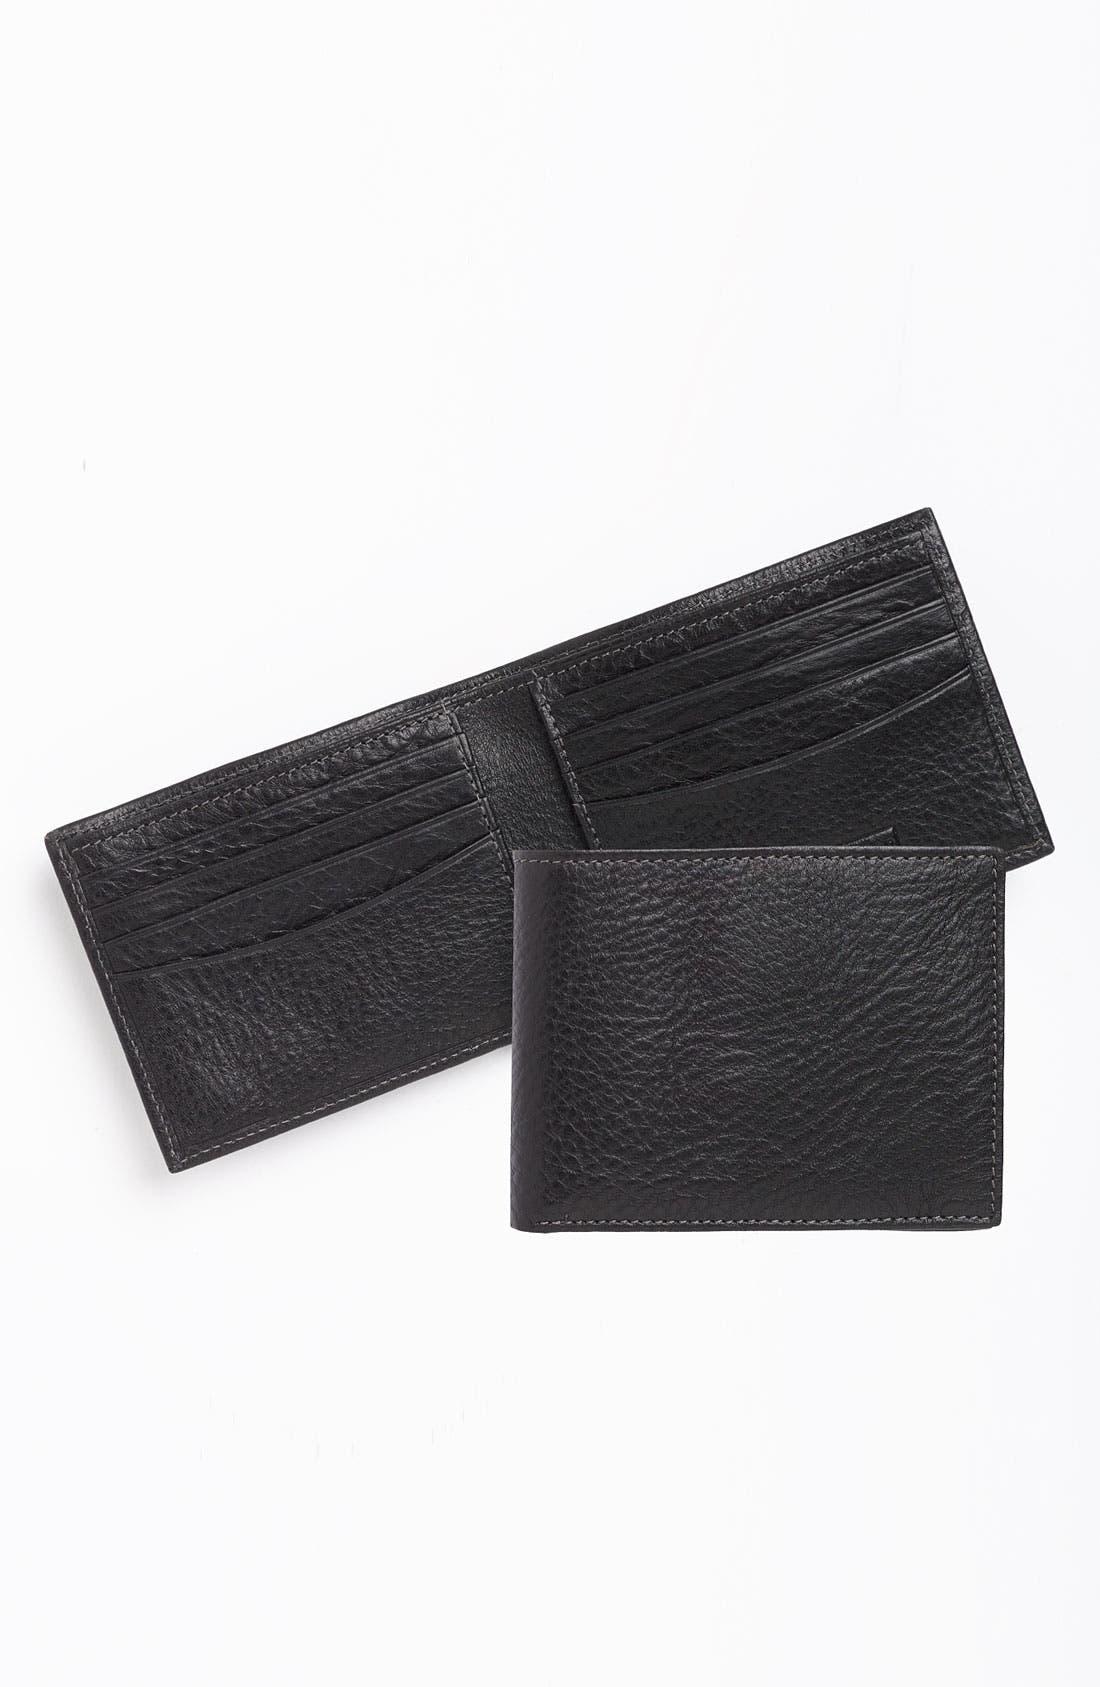 Main Image - Trafalgar 'Chesapeake' Slimfold Wallet